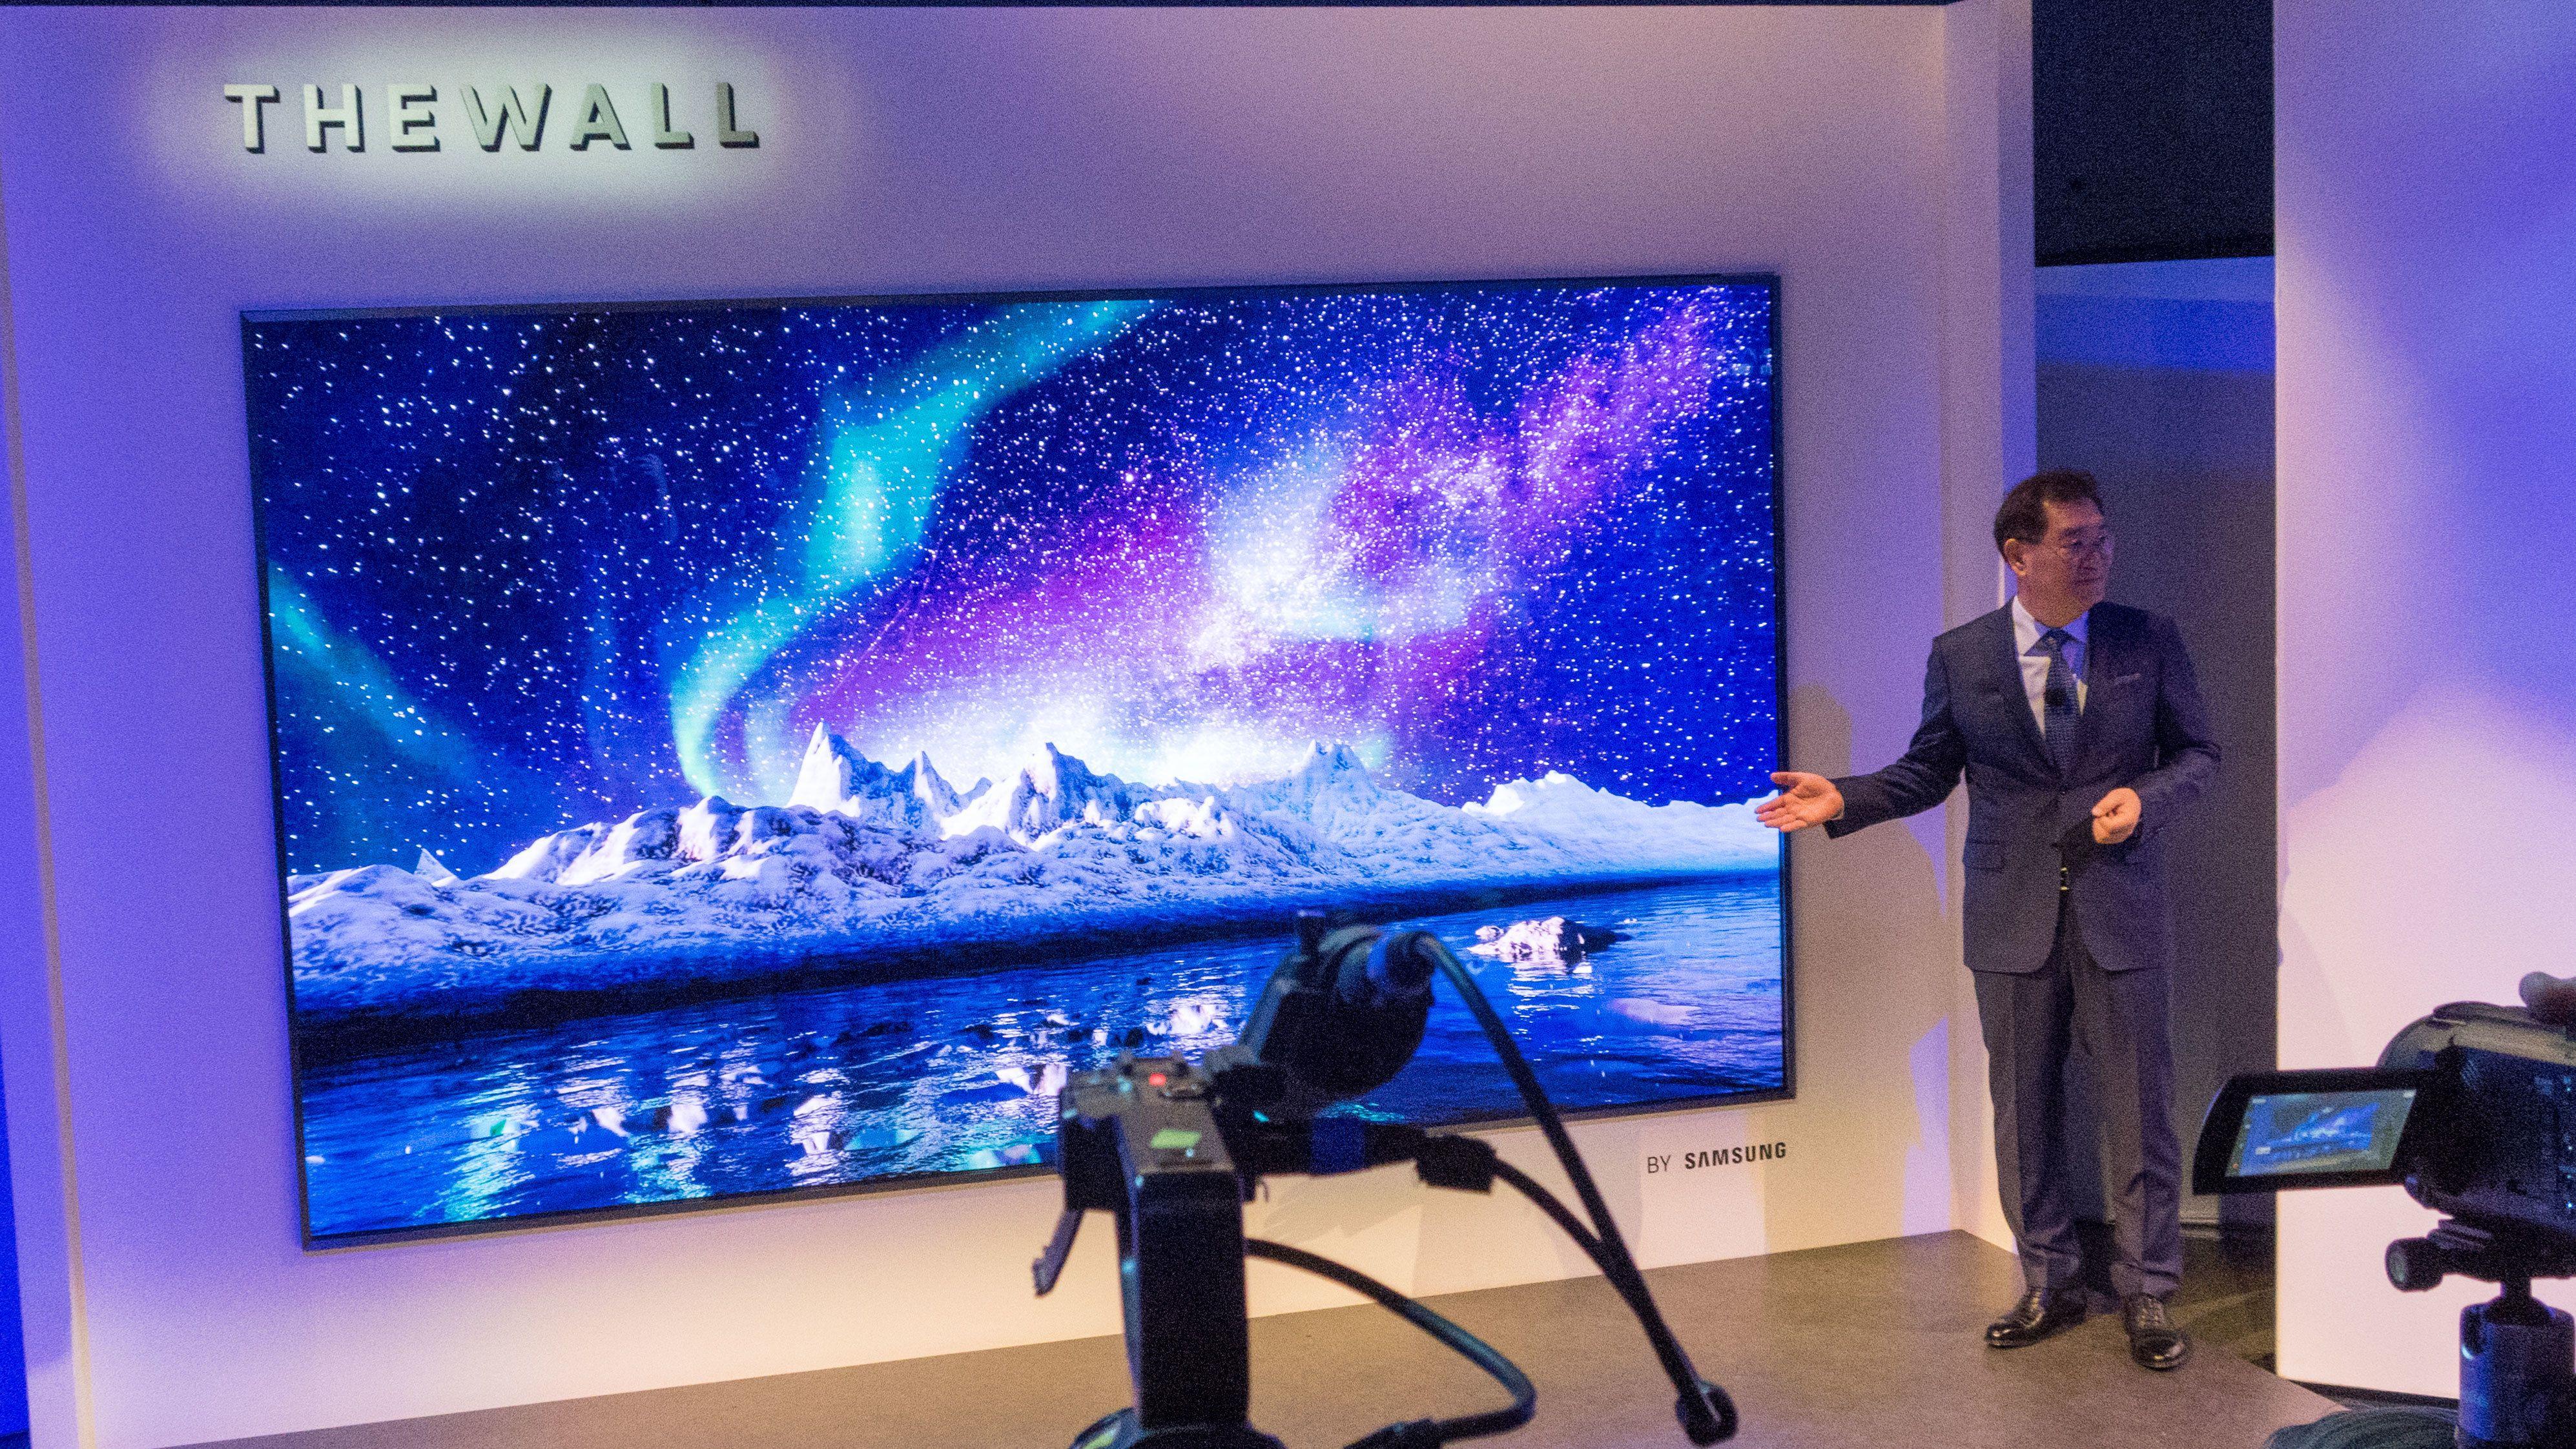 Samsung viste for første gang frem MicroLED Bilde: Ole Henrik Johansen / Tek.no